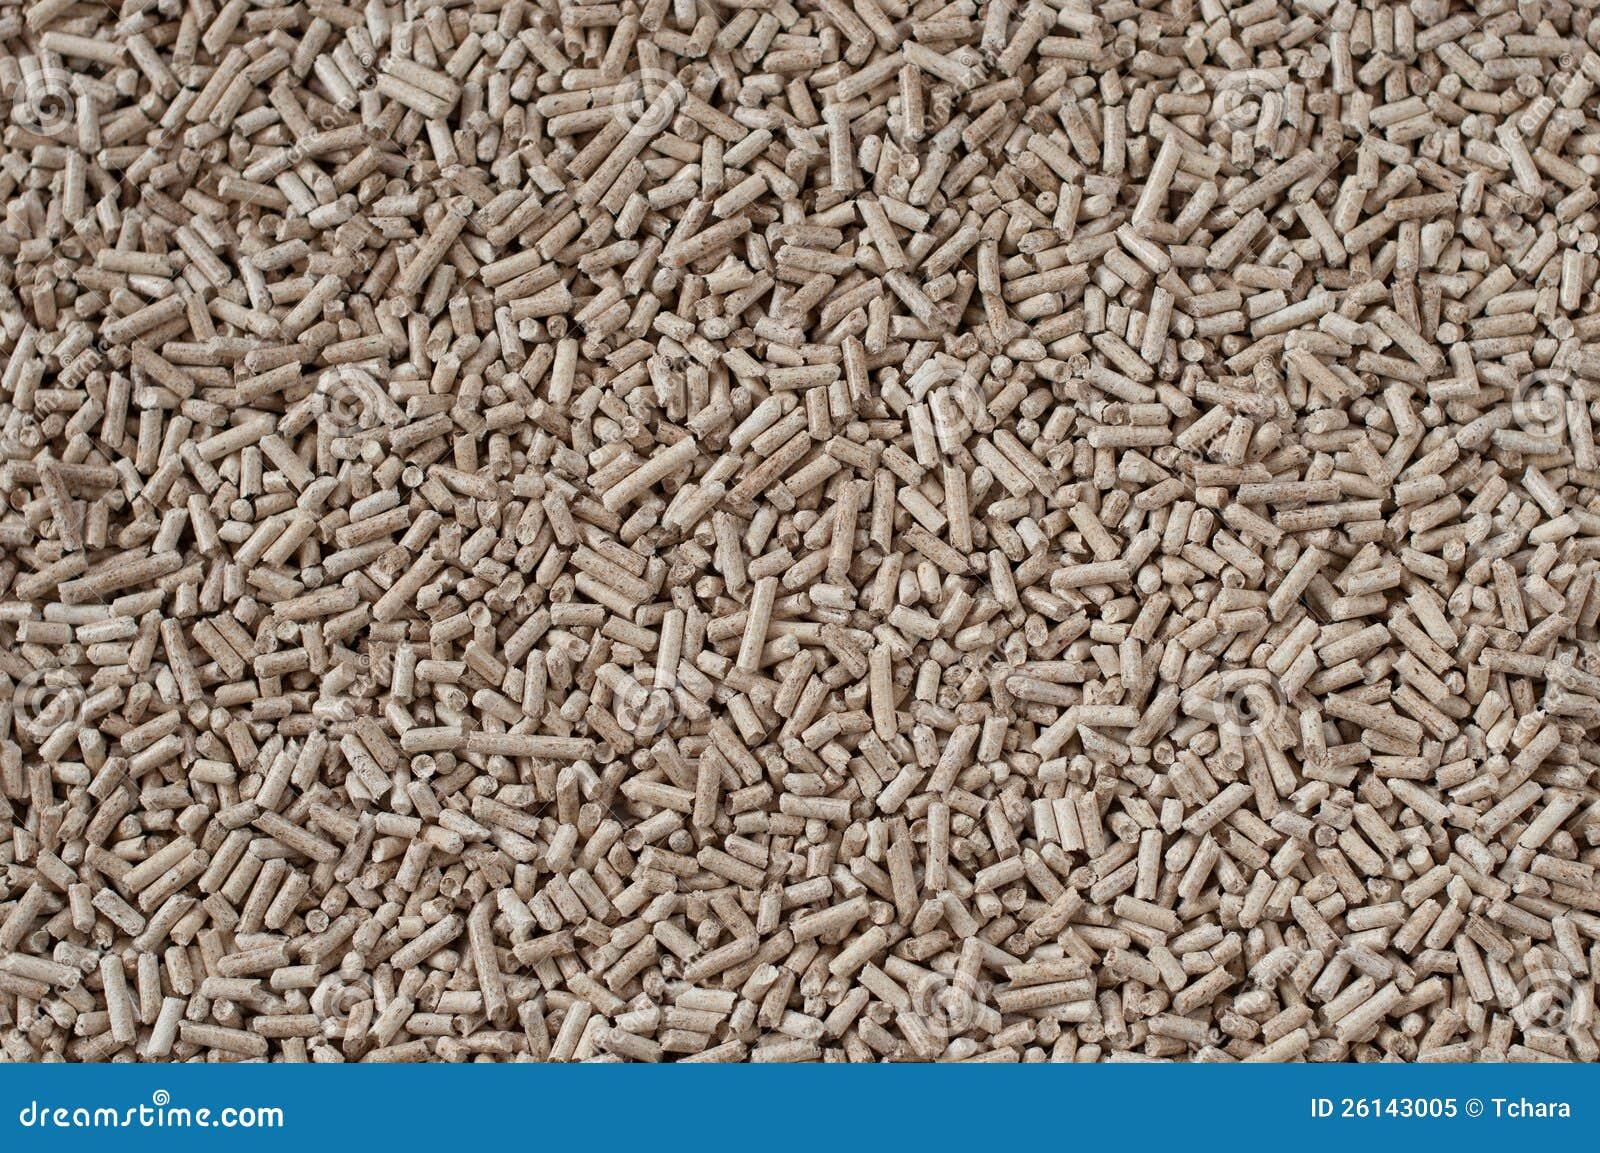 pellets biomass royalty free stock photo image 26143005. Black Bedroom Furniture Sets. Home Design Ideas